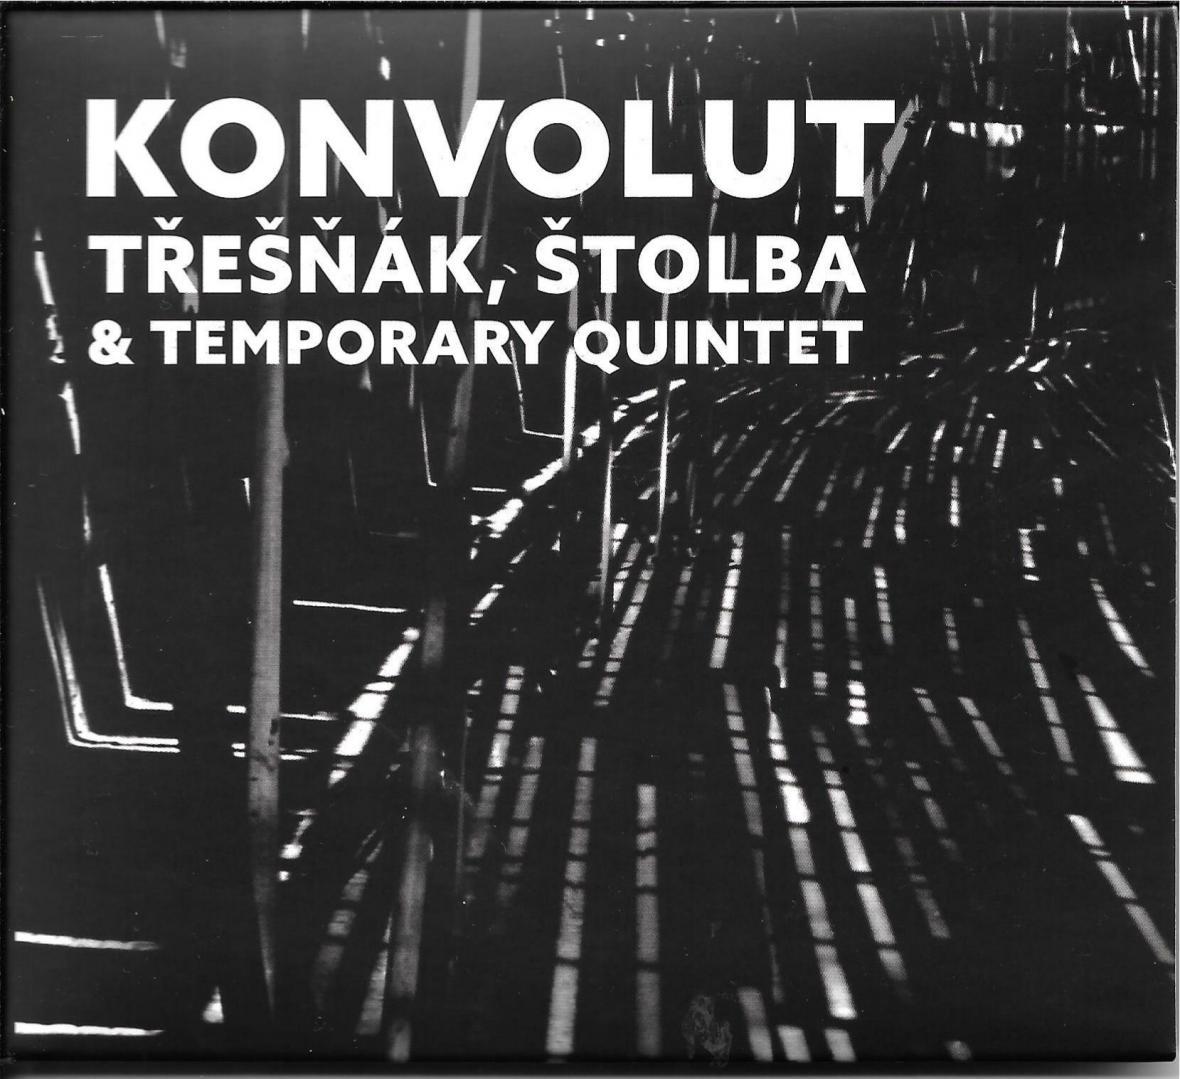 Vlastimil Třešňák, Jan Štolba & Temporary Quintet / Konvolut